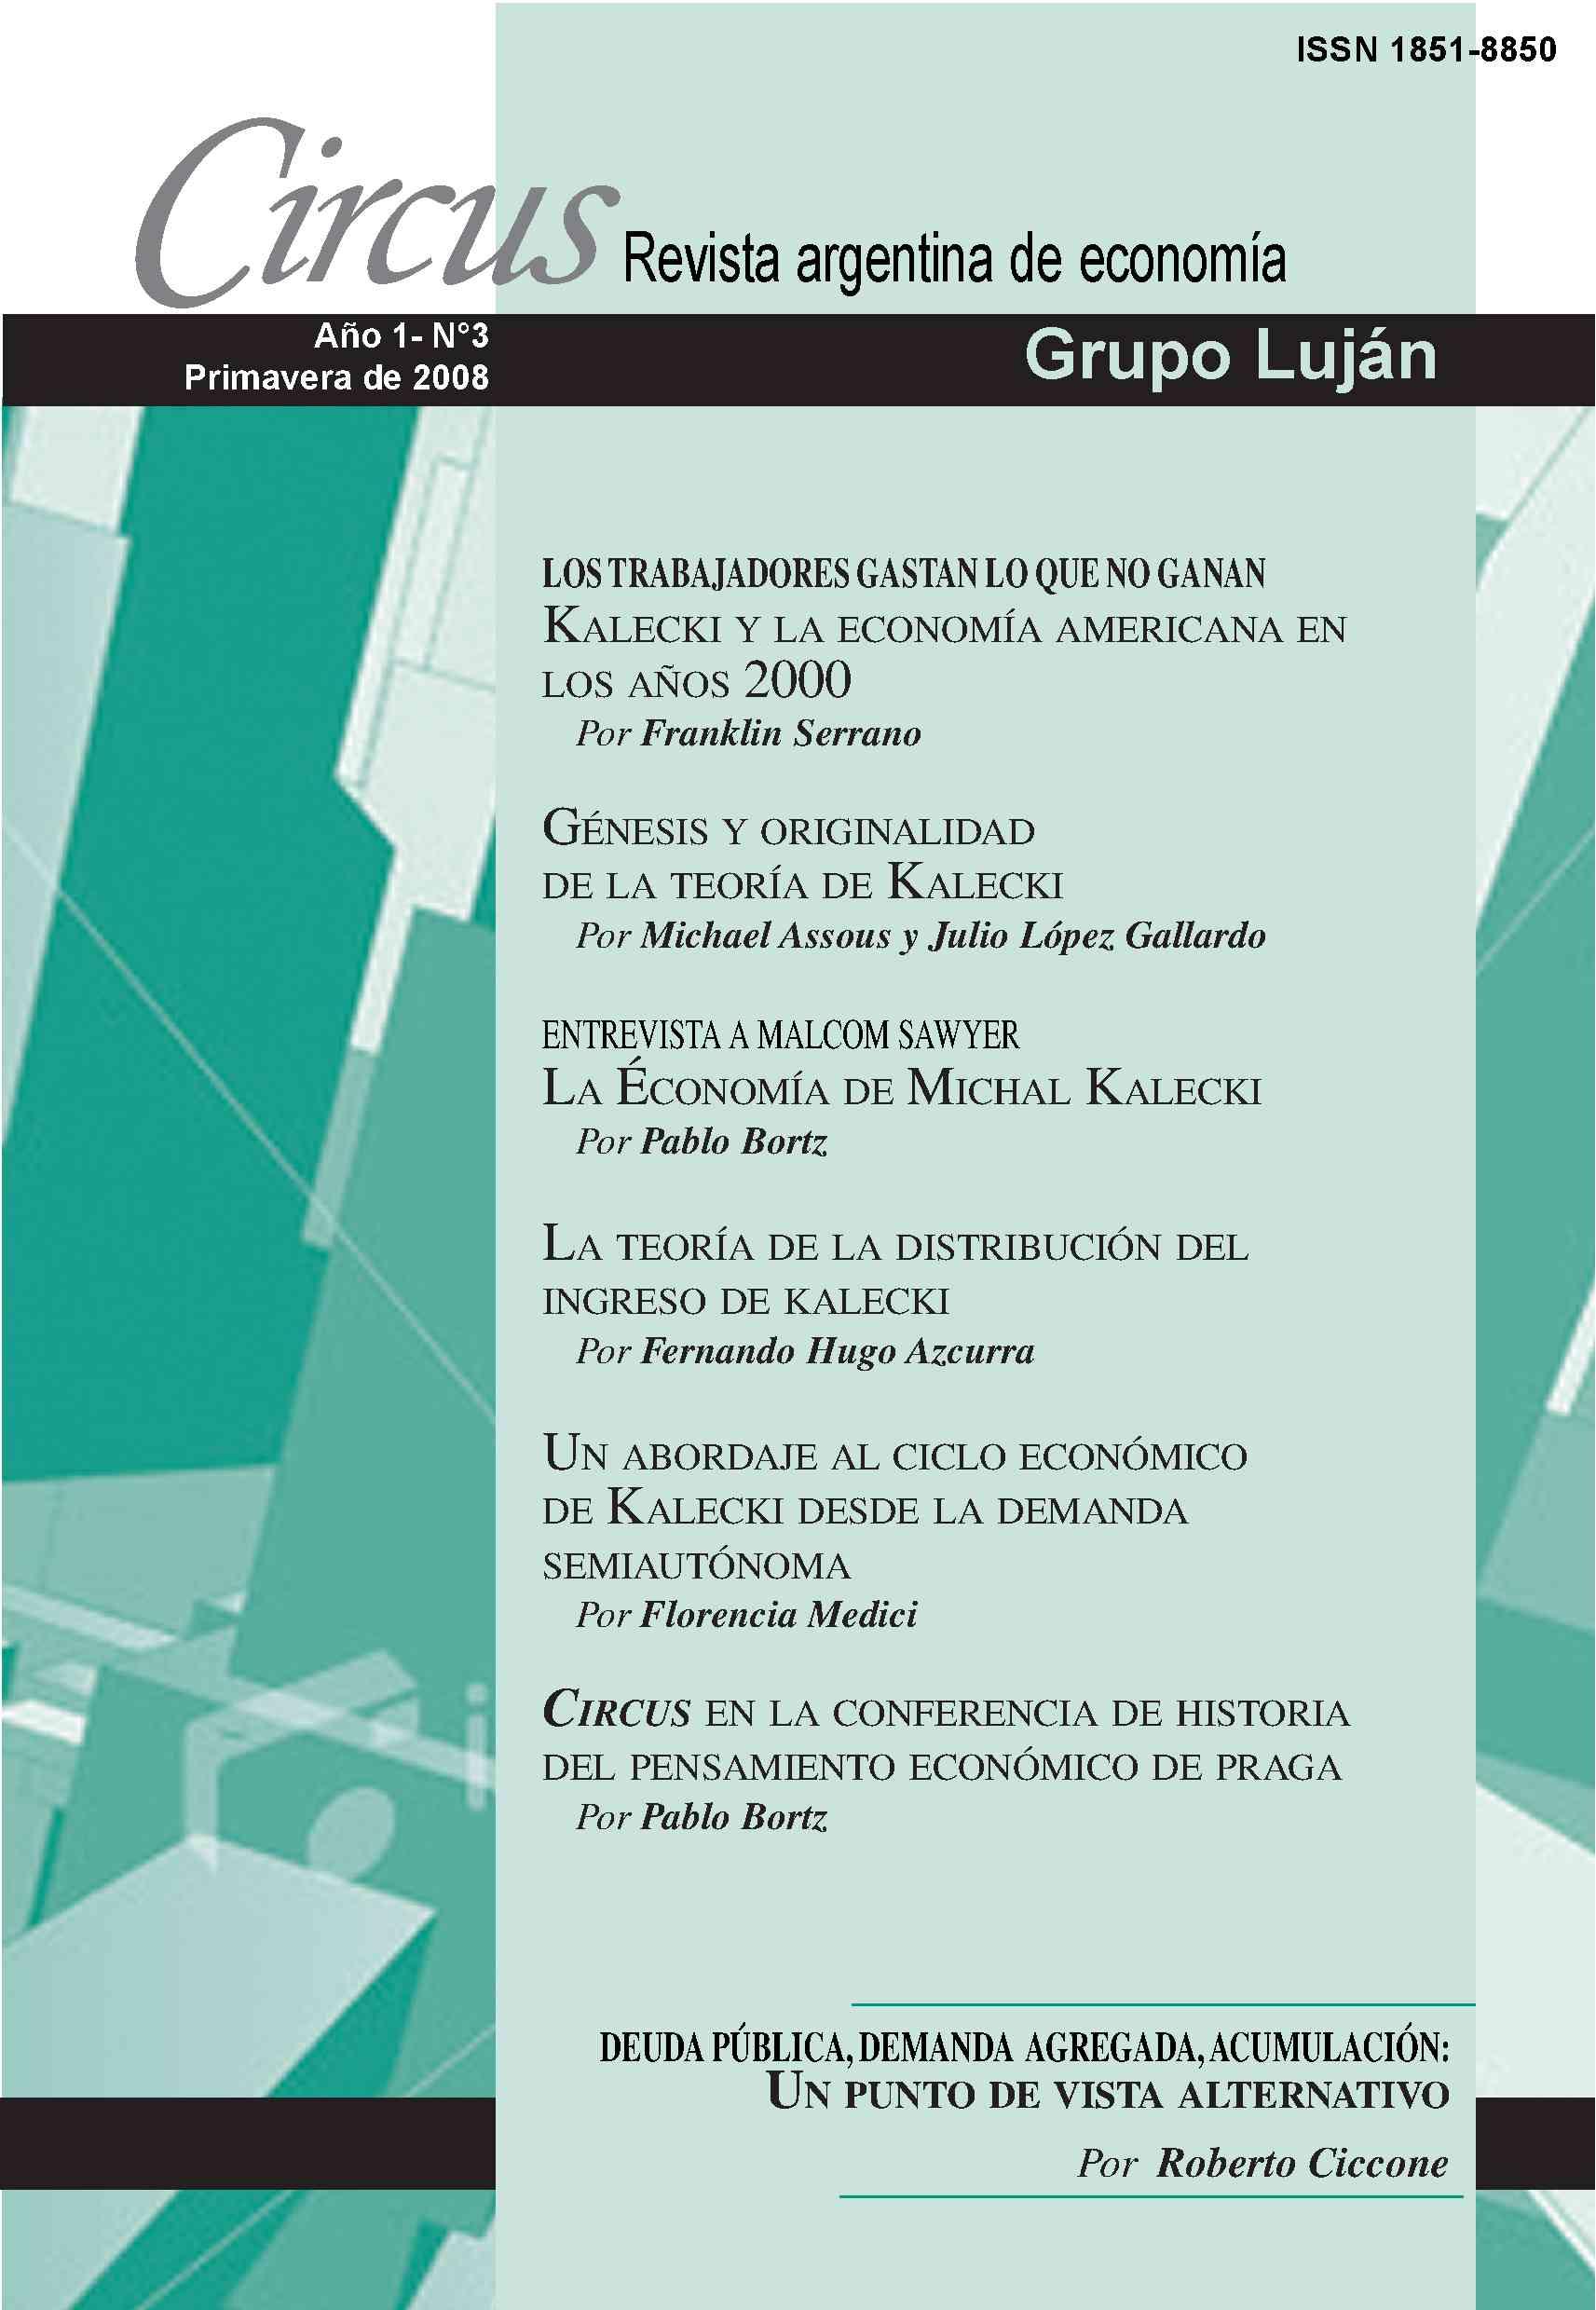 img-art01